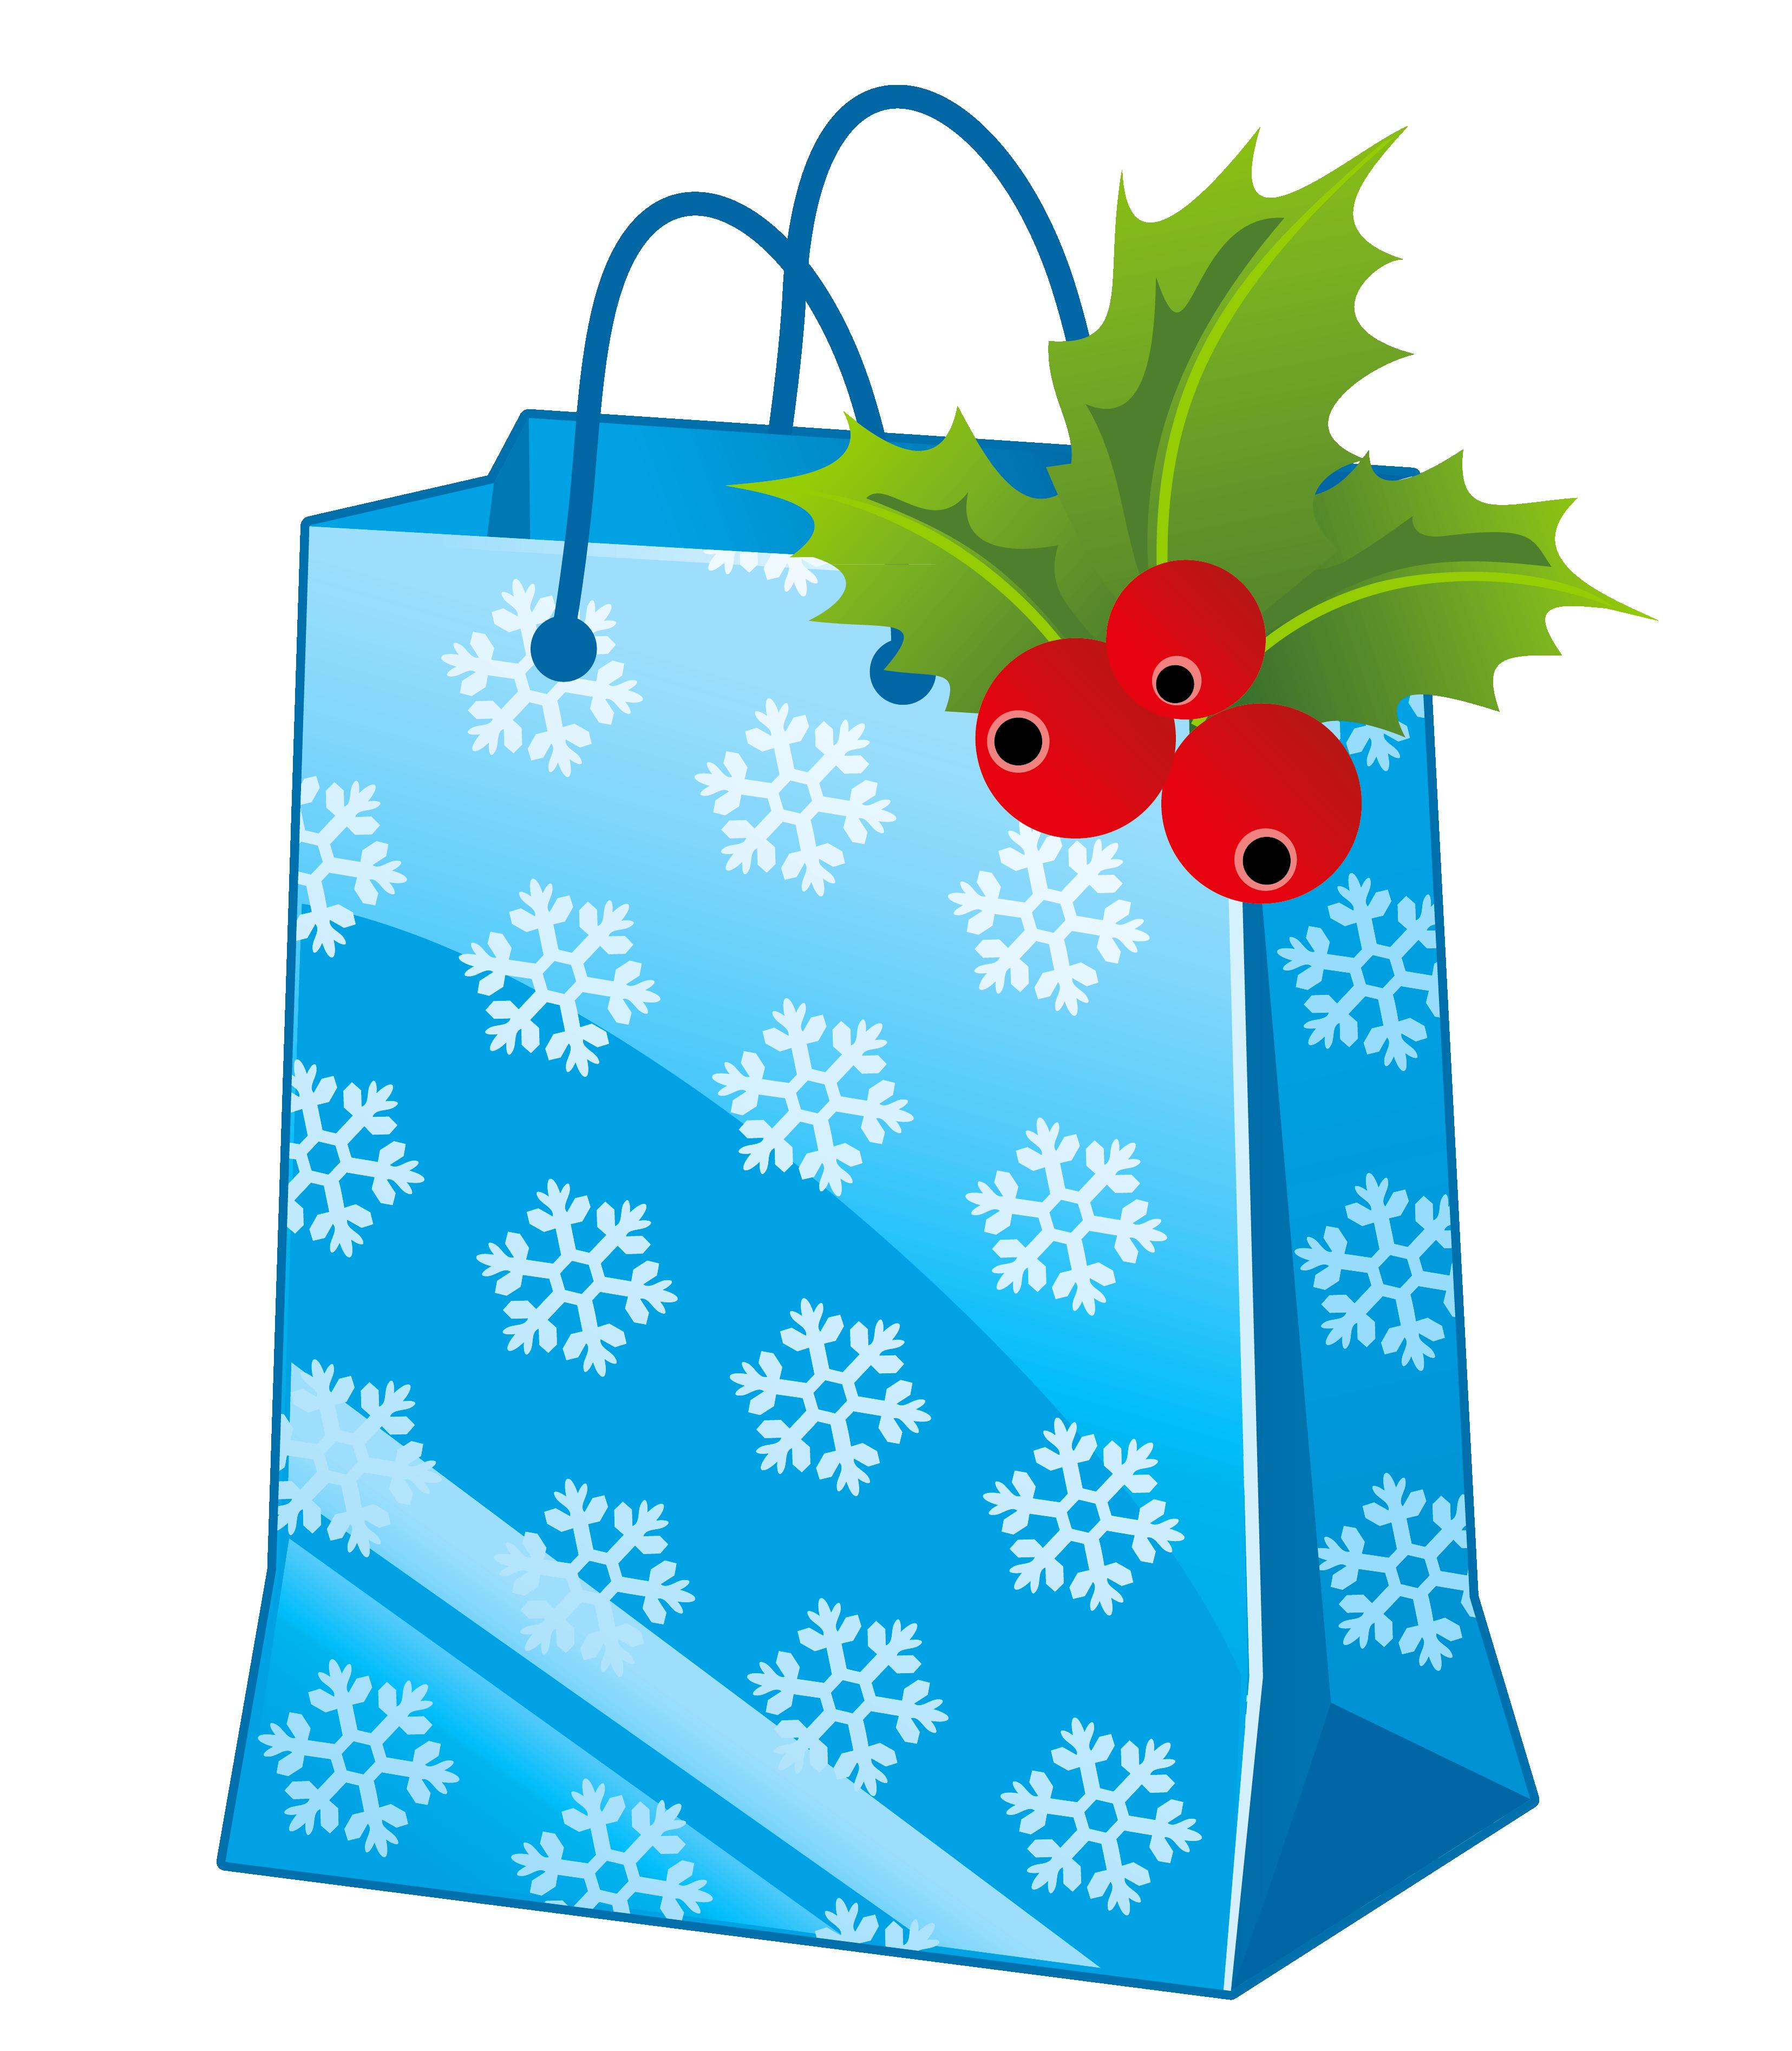 Clipart birthday bag. Transparent christmas blue gift